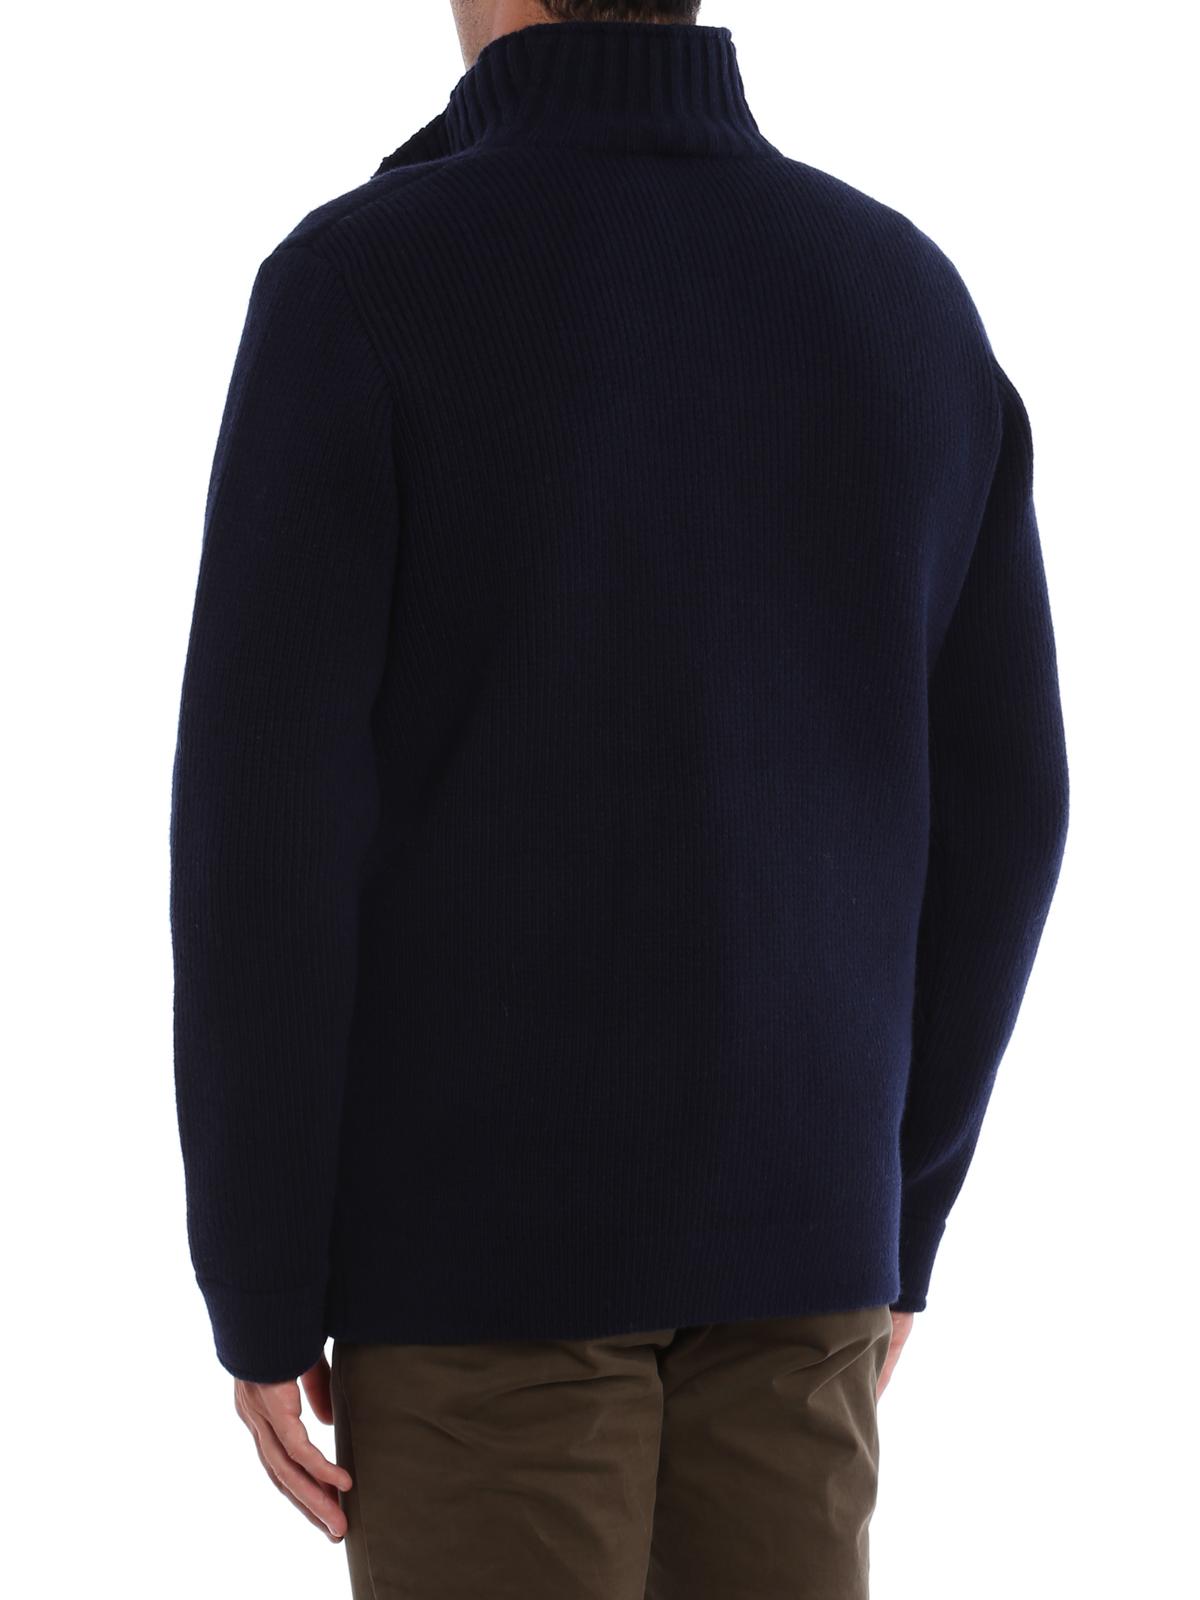 Fay Giacca in lana a maglia con gilet giacche casual